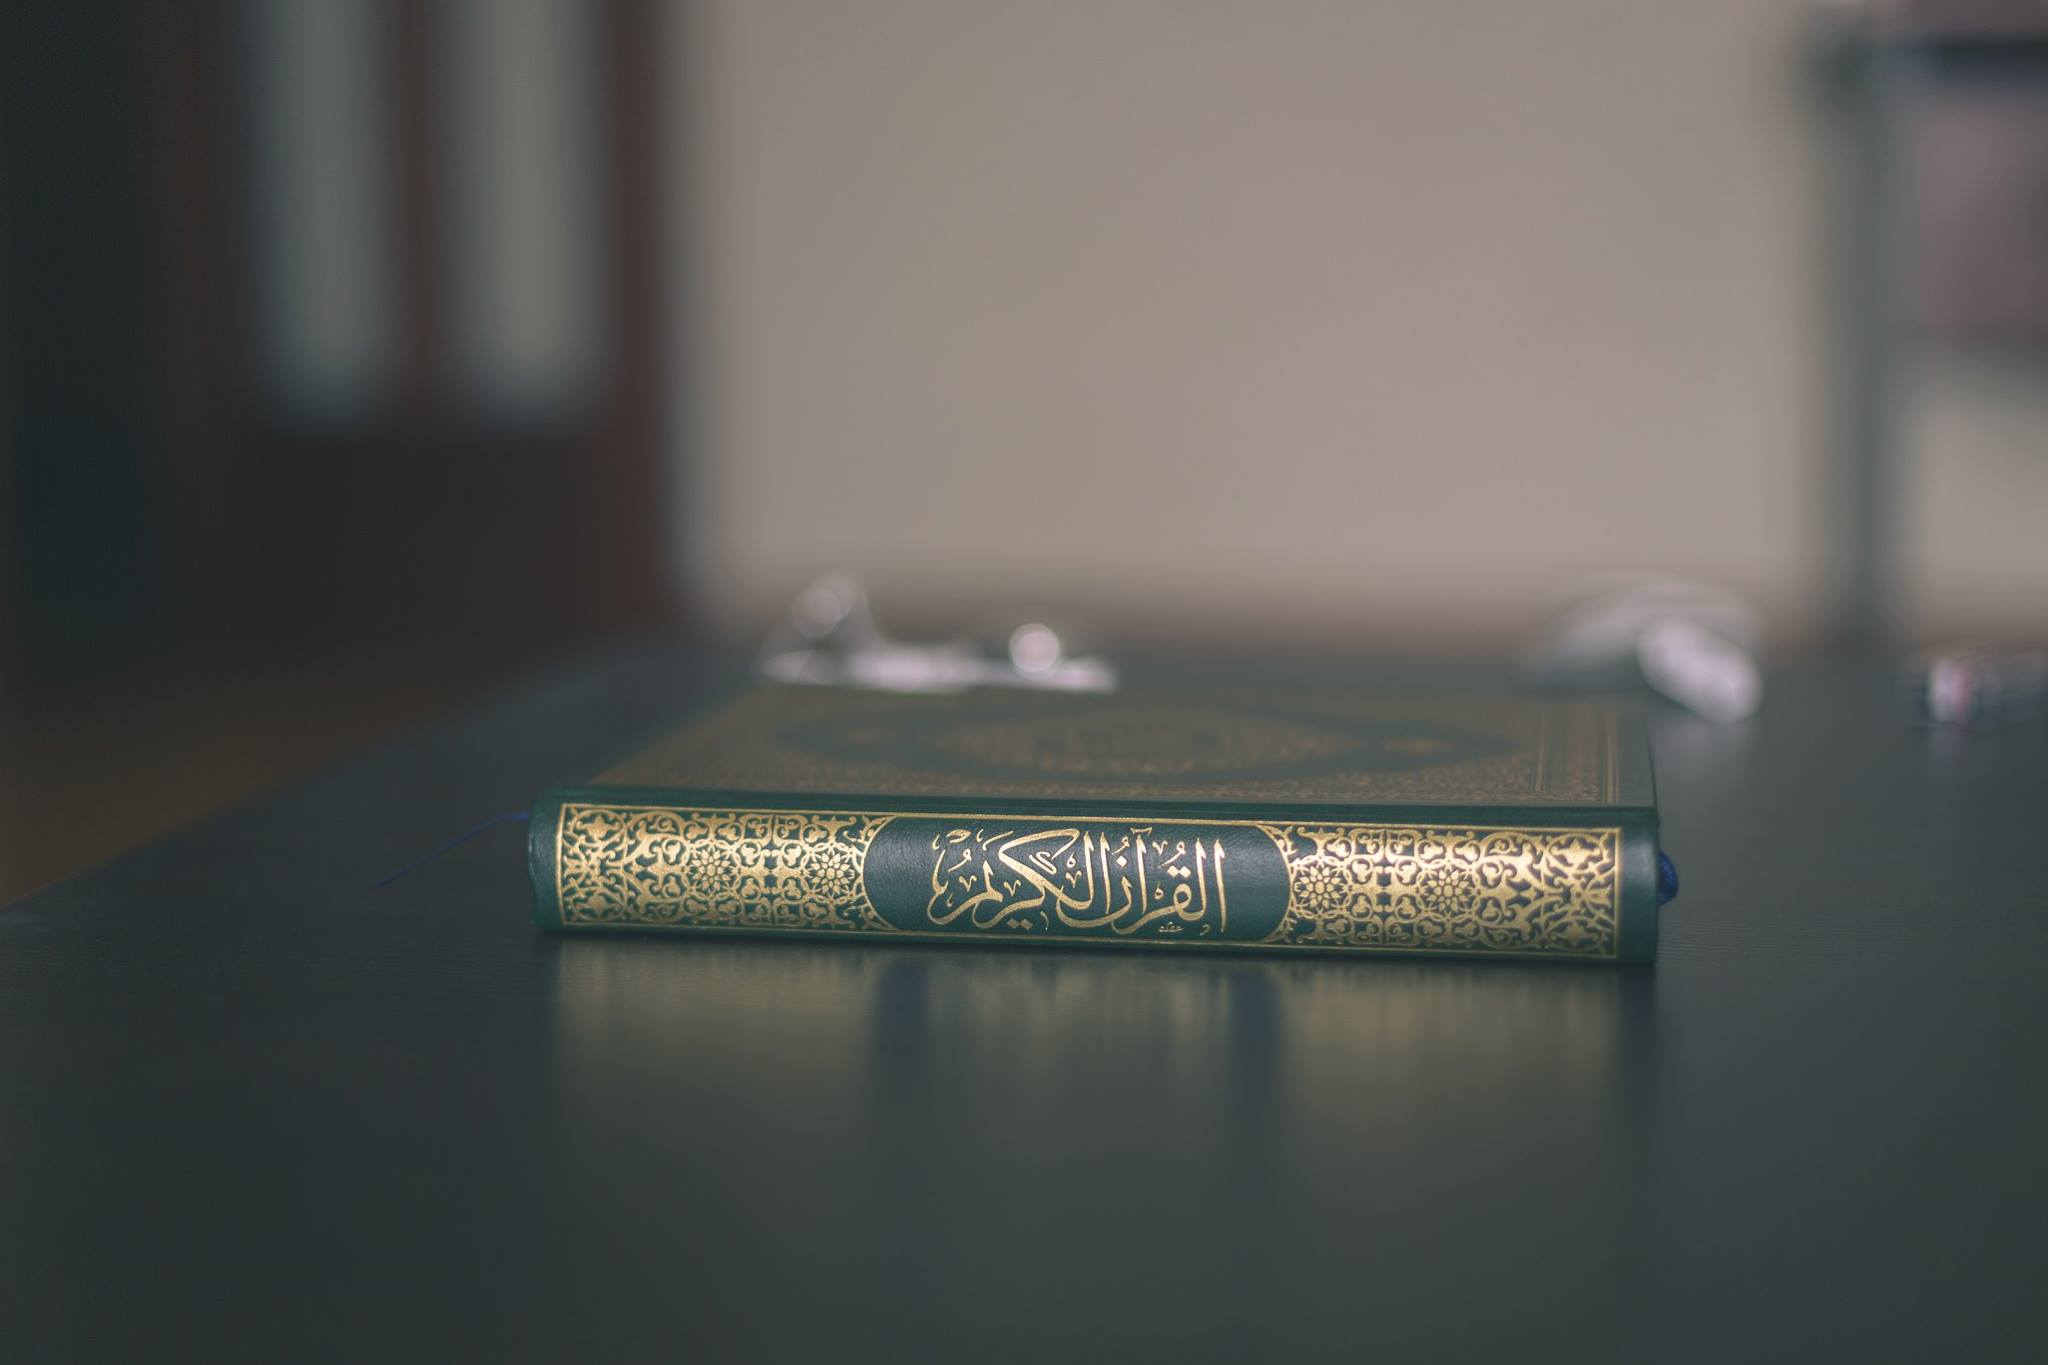 Достоинство чтения корана и тех кто